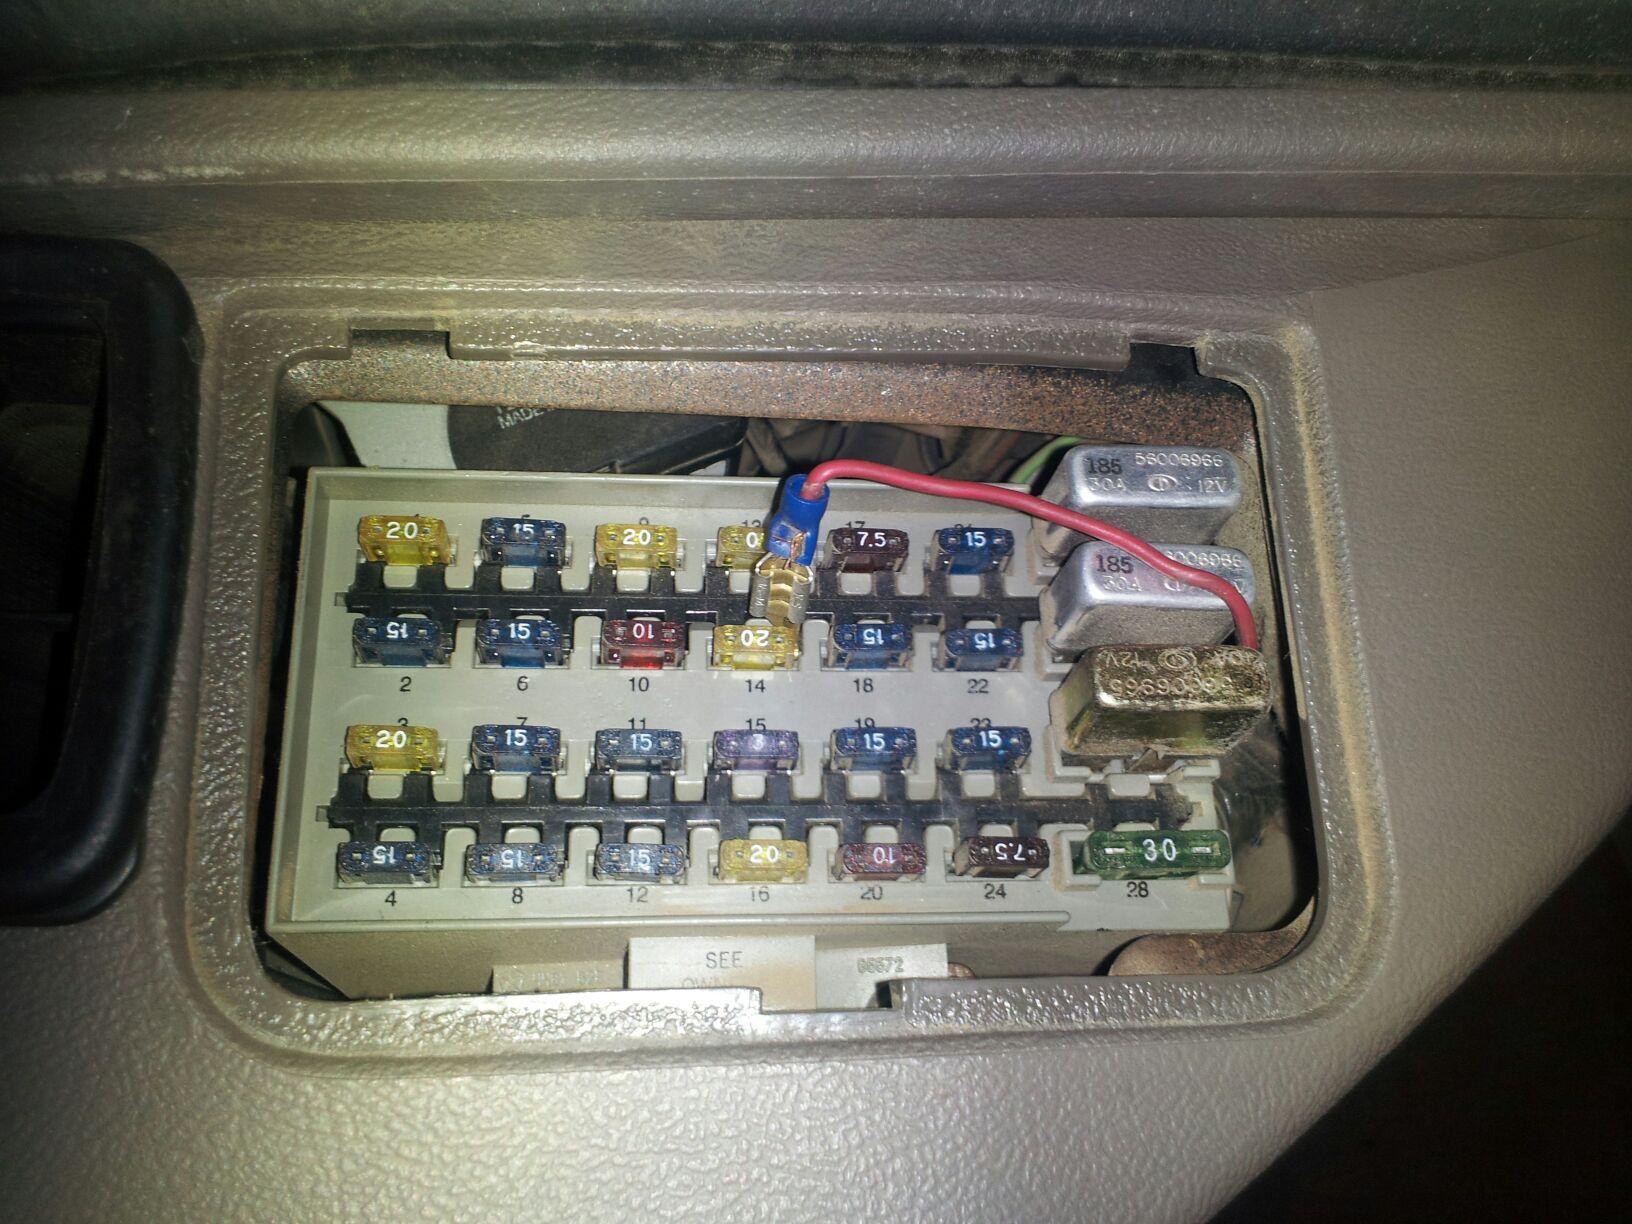 2009 jeep wrangler unlimited radio wiring diagram rj11 rj12 2013 fuse box autos post